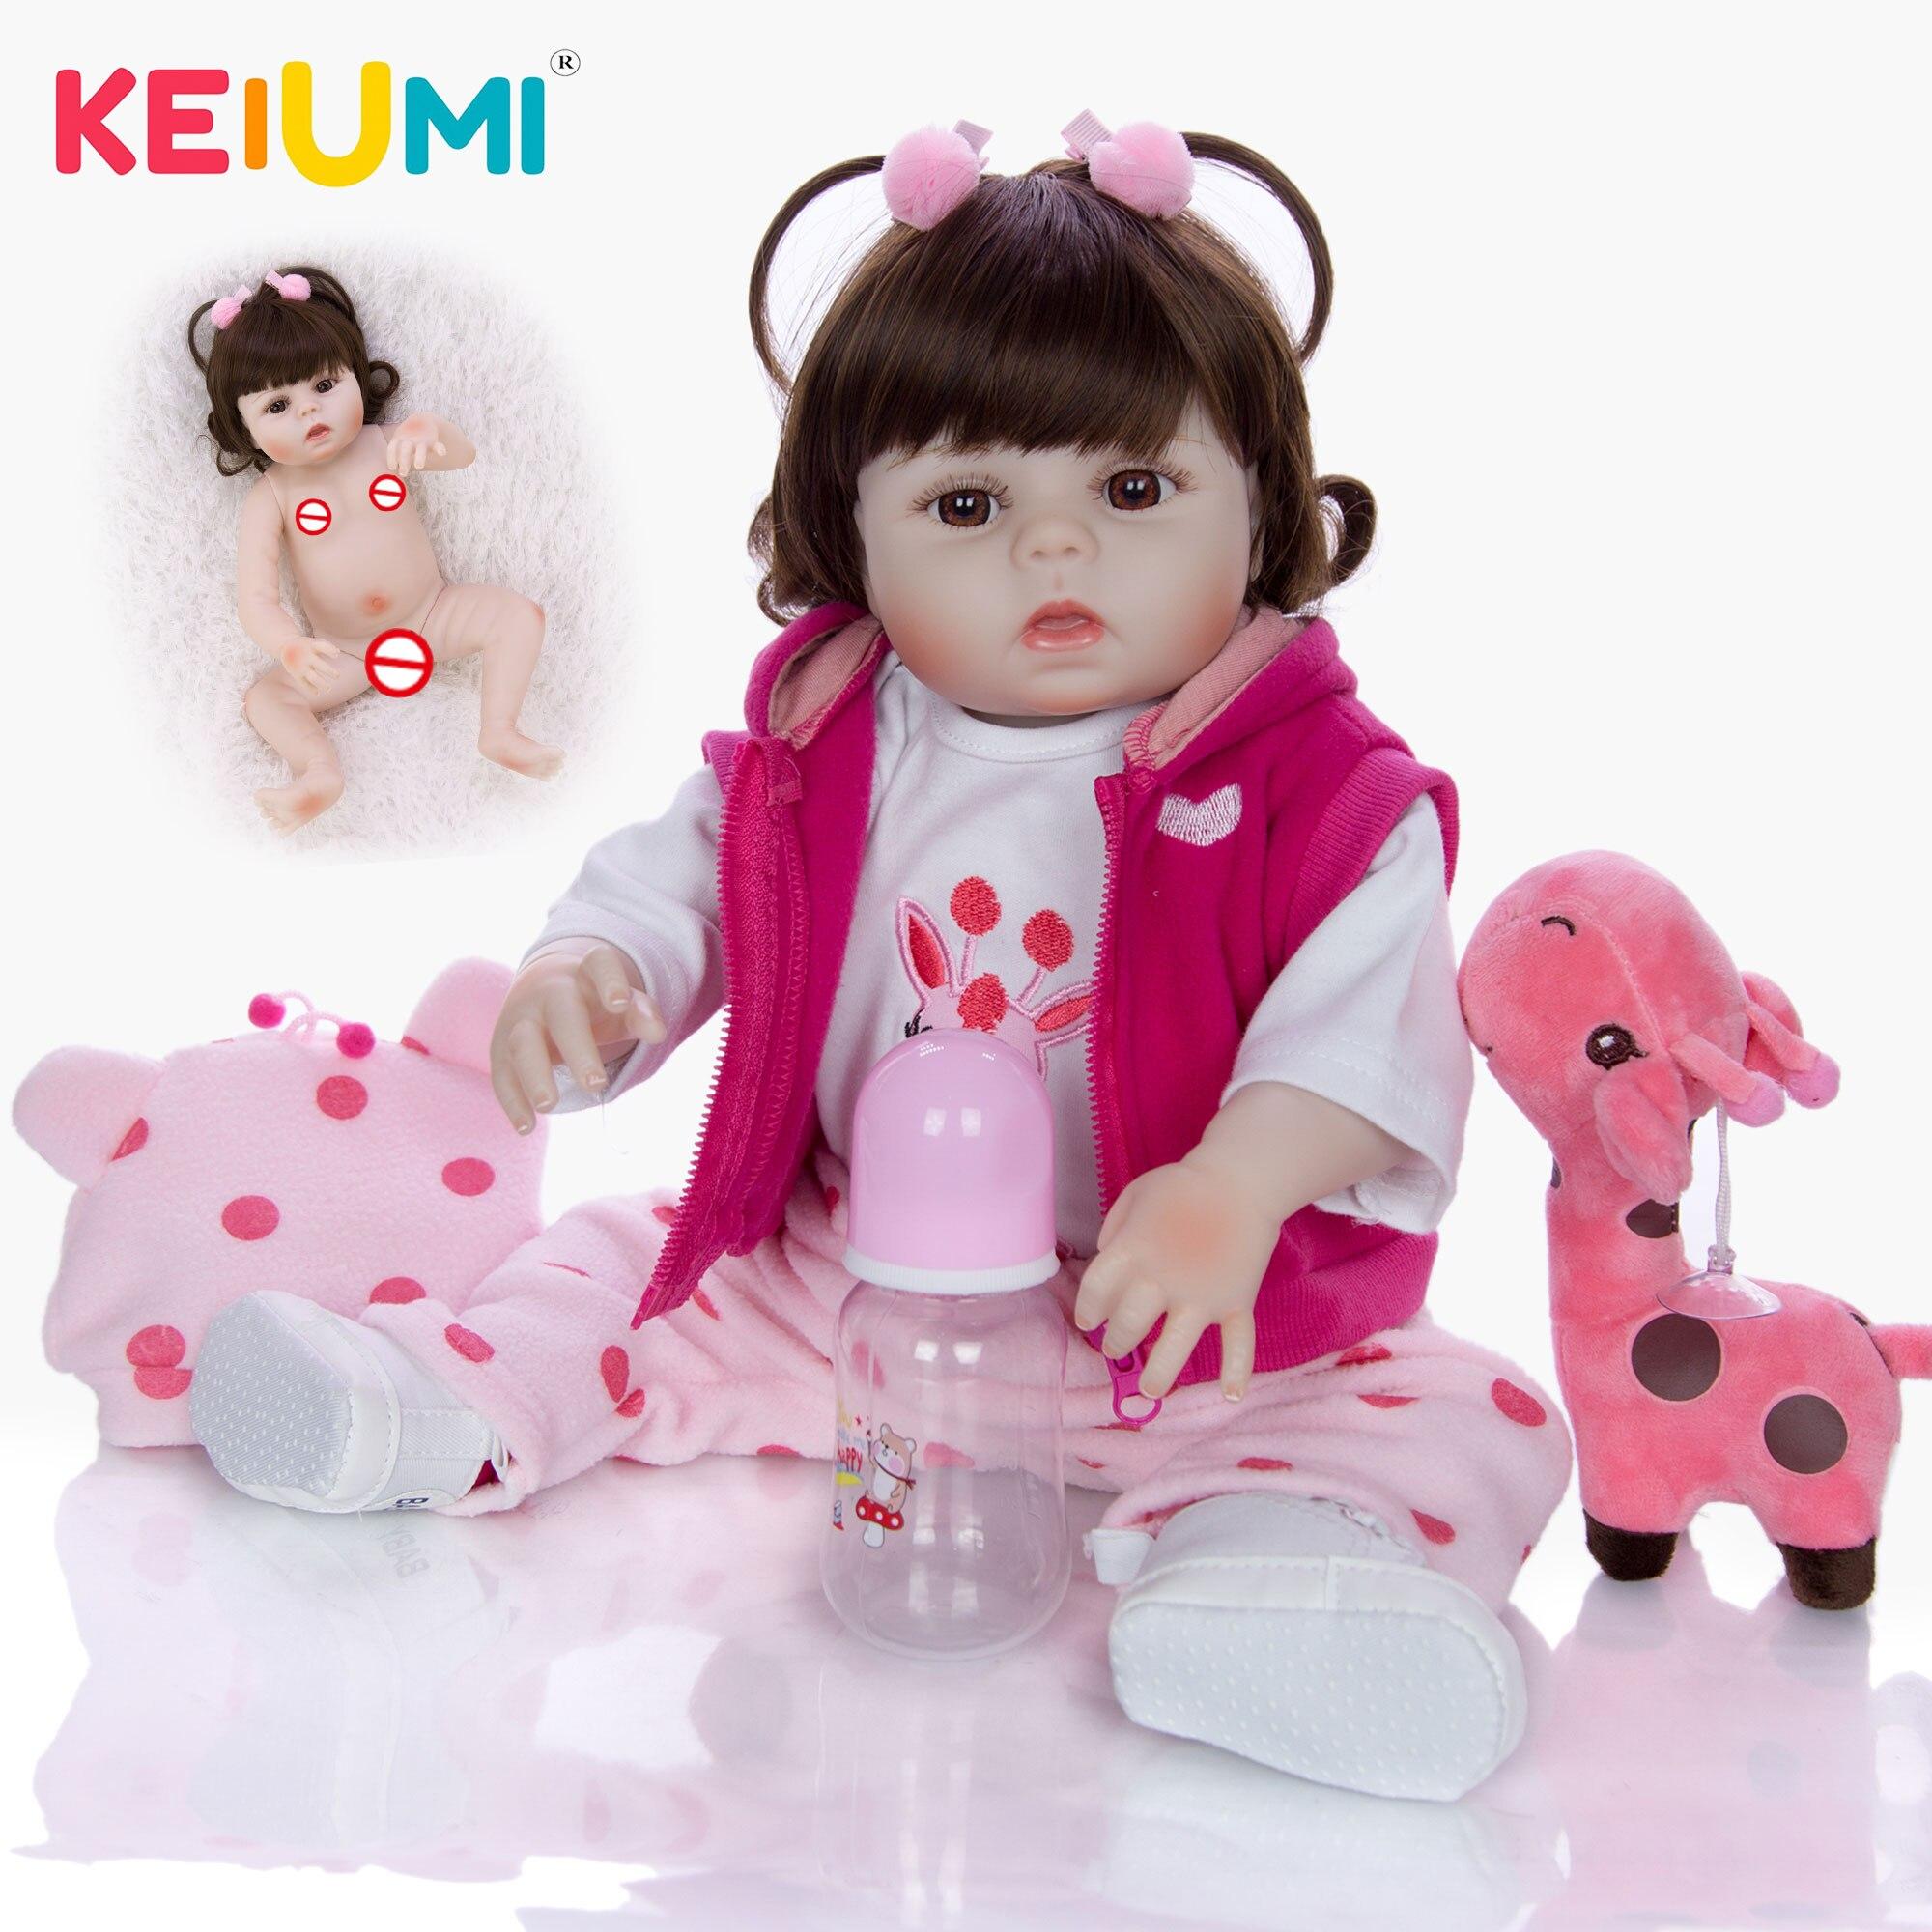 Bebe reborn realiste bébé reborn fille poupée reborn Keiumi 0002